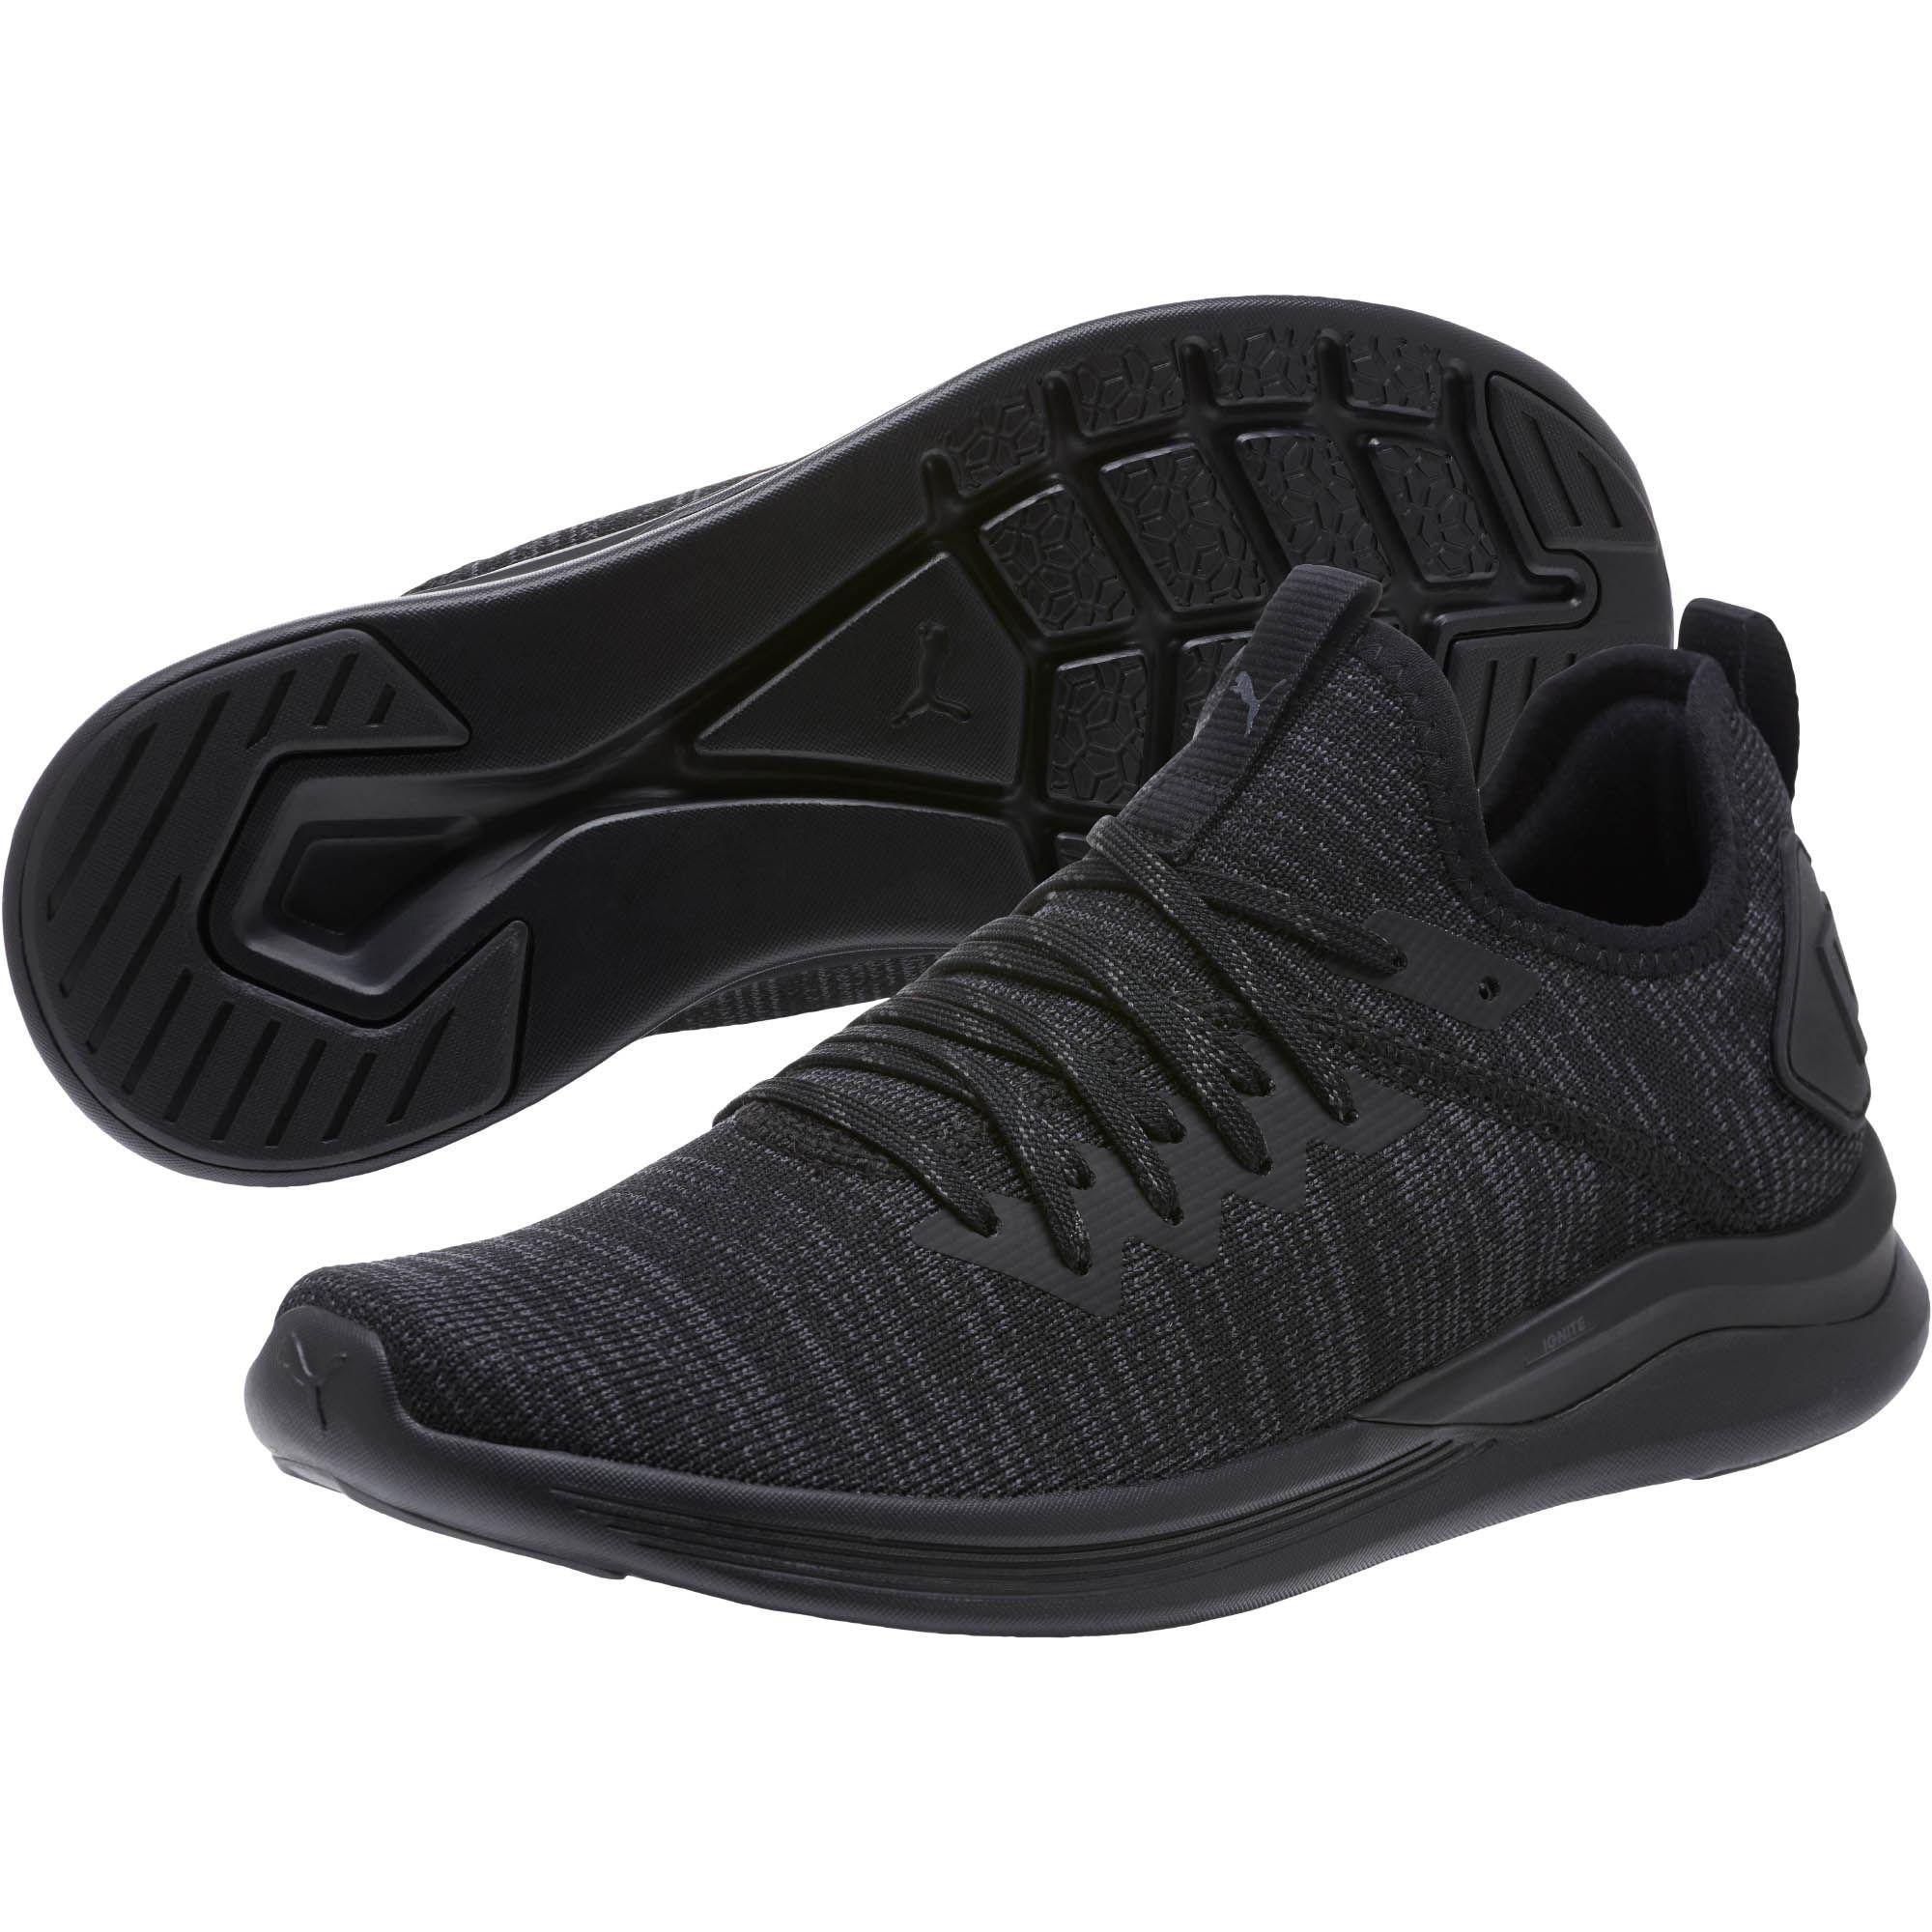 264620347c48 PUMA Ignite Flash Evoknit Women s Training Shoes in Black - Lyst